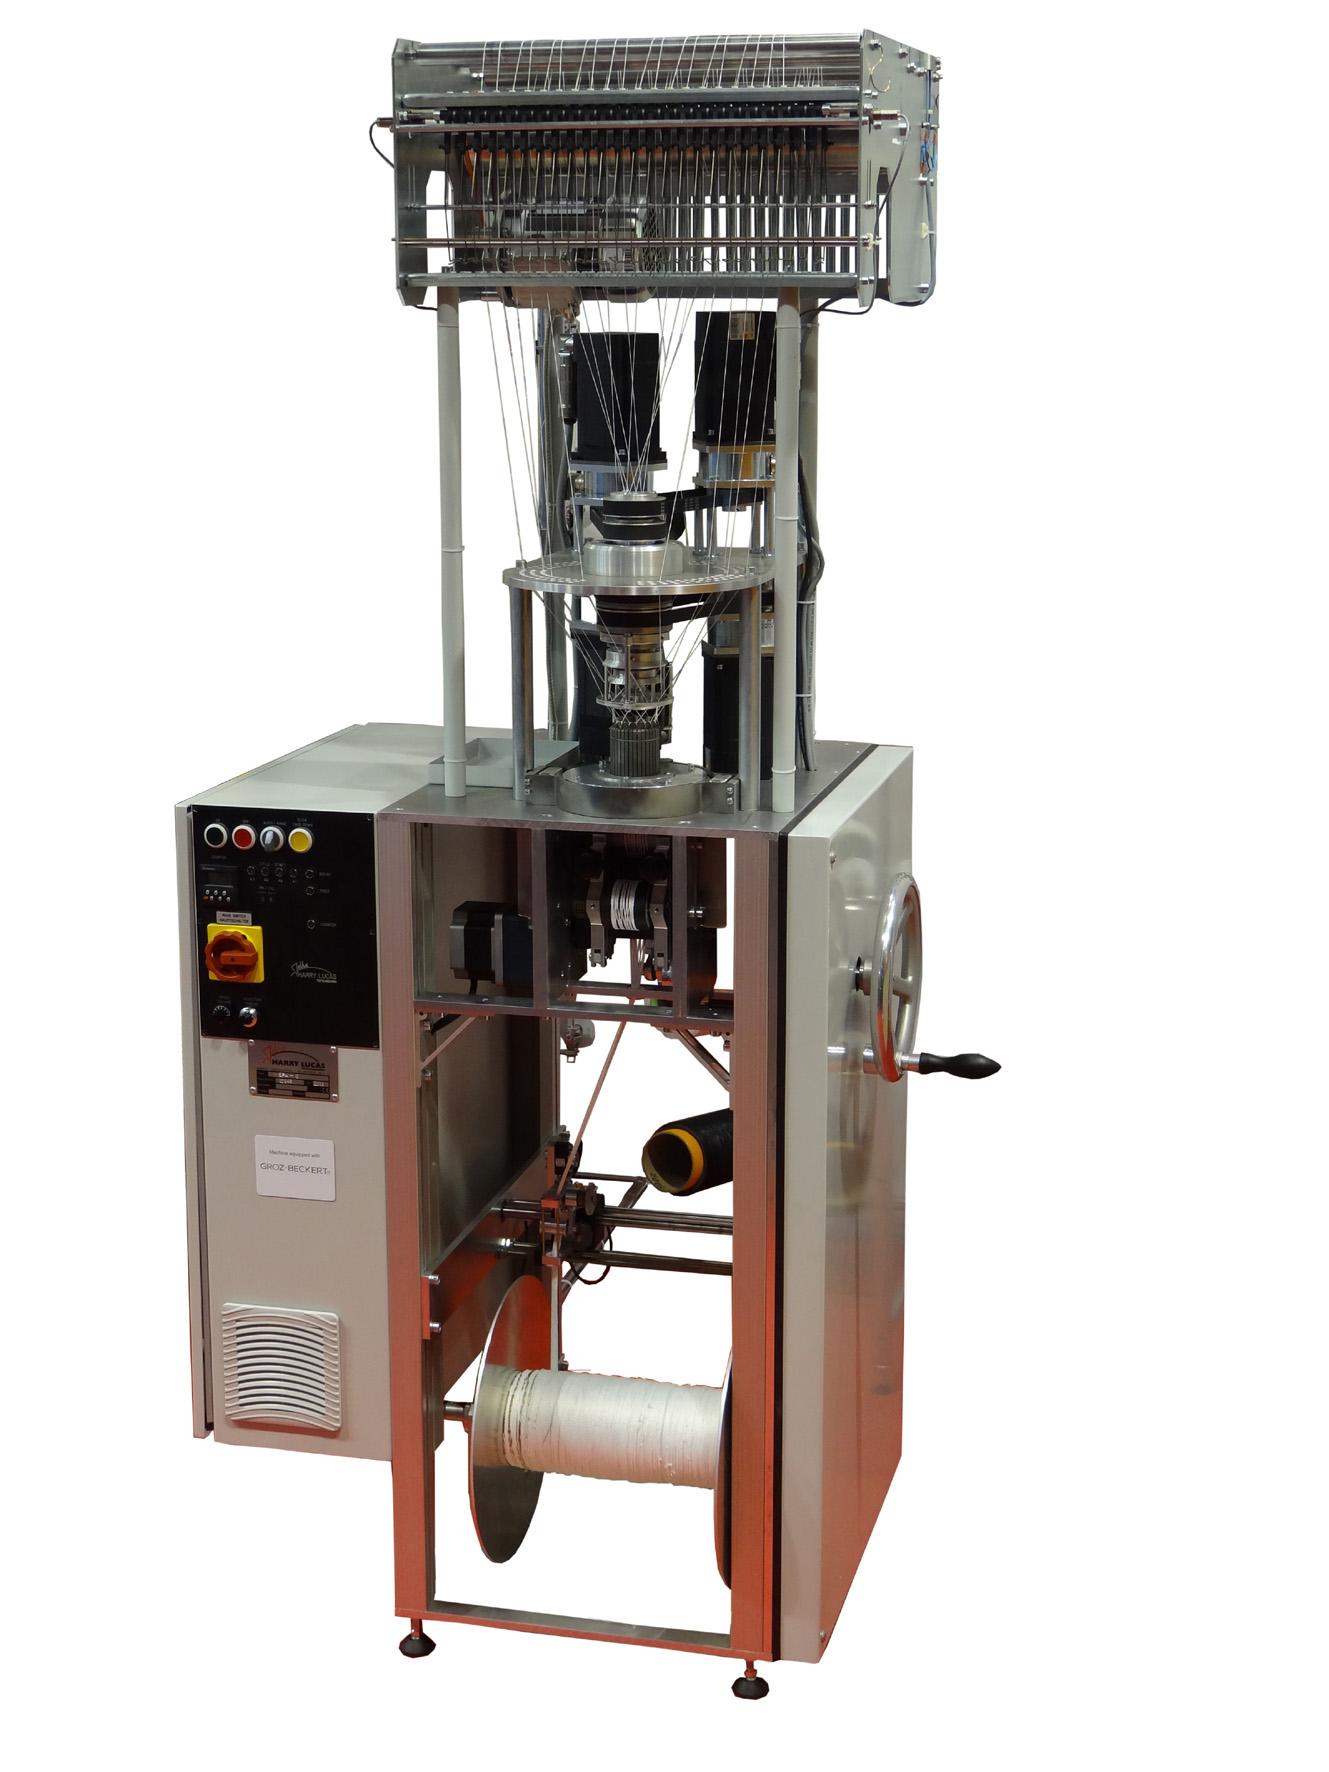 lucas machine cost